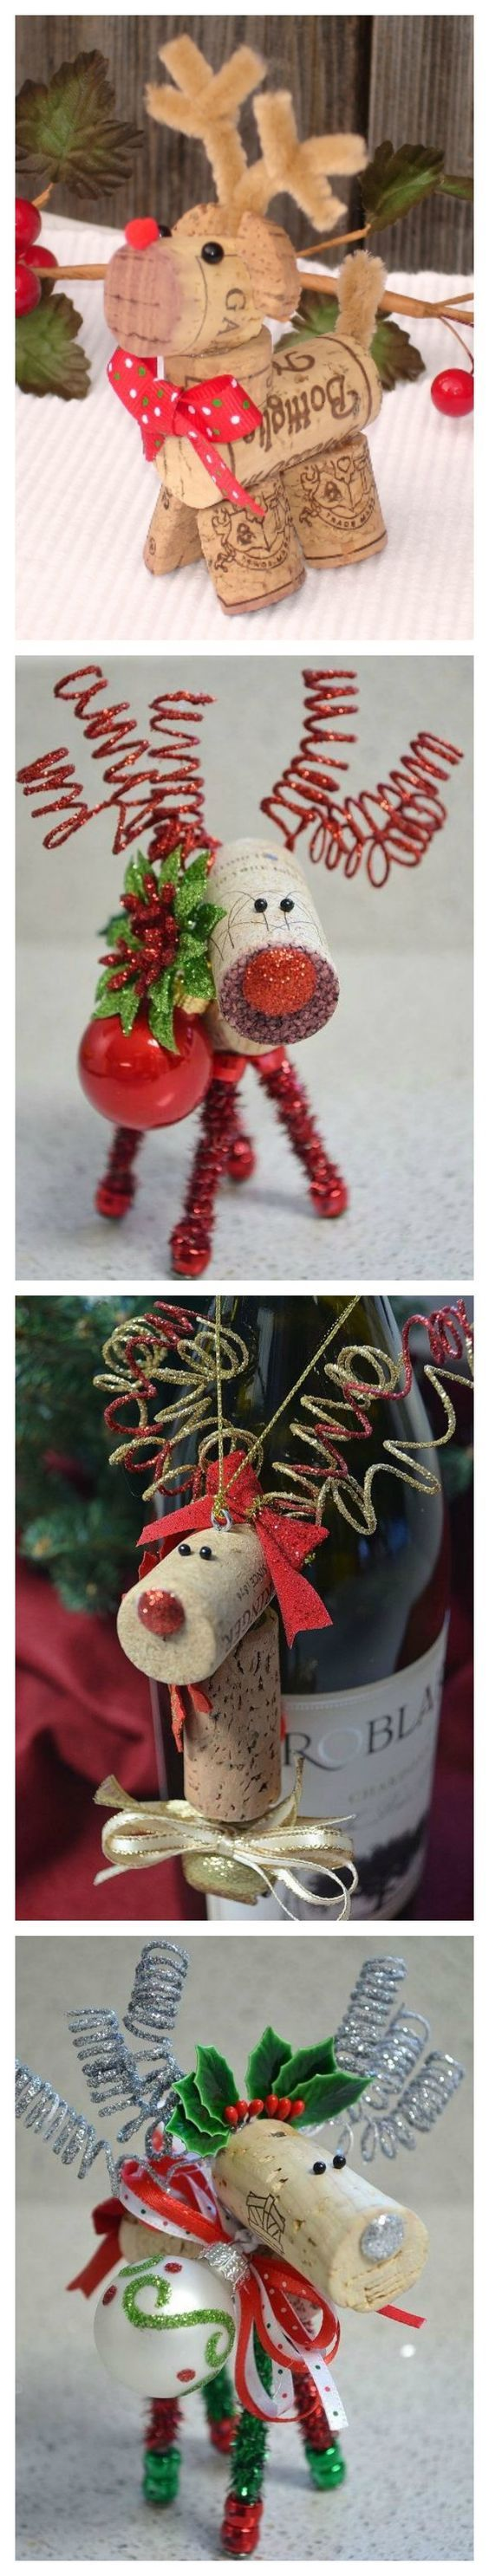 17 Epic Christmas Craft Ideas   Reindeer craft, Cork and Craft